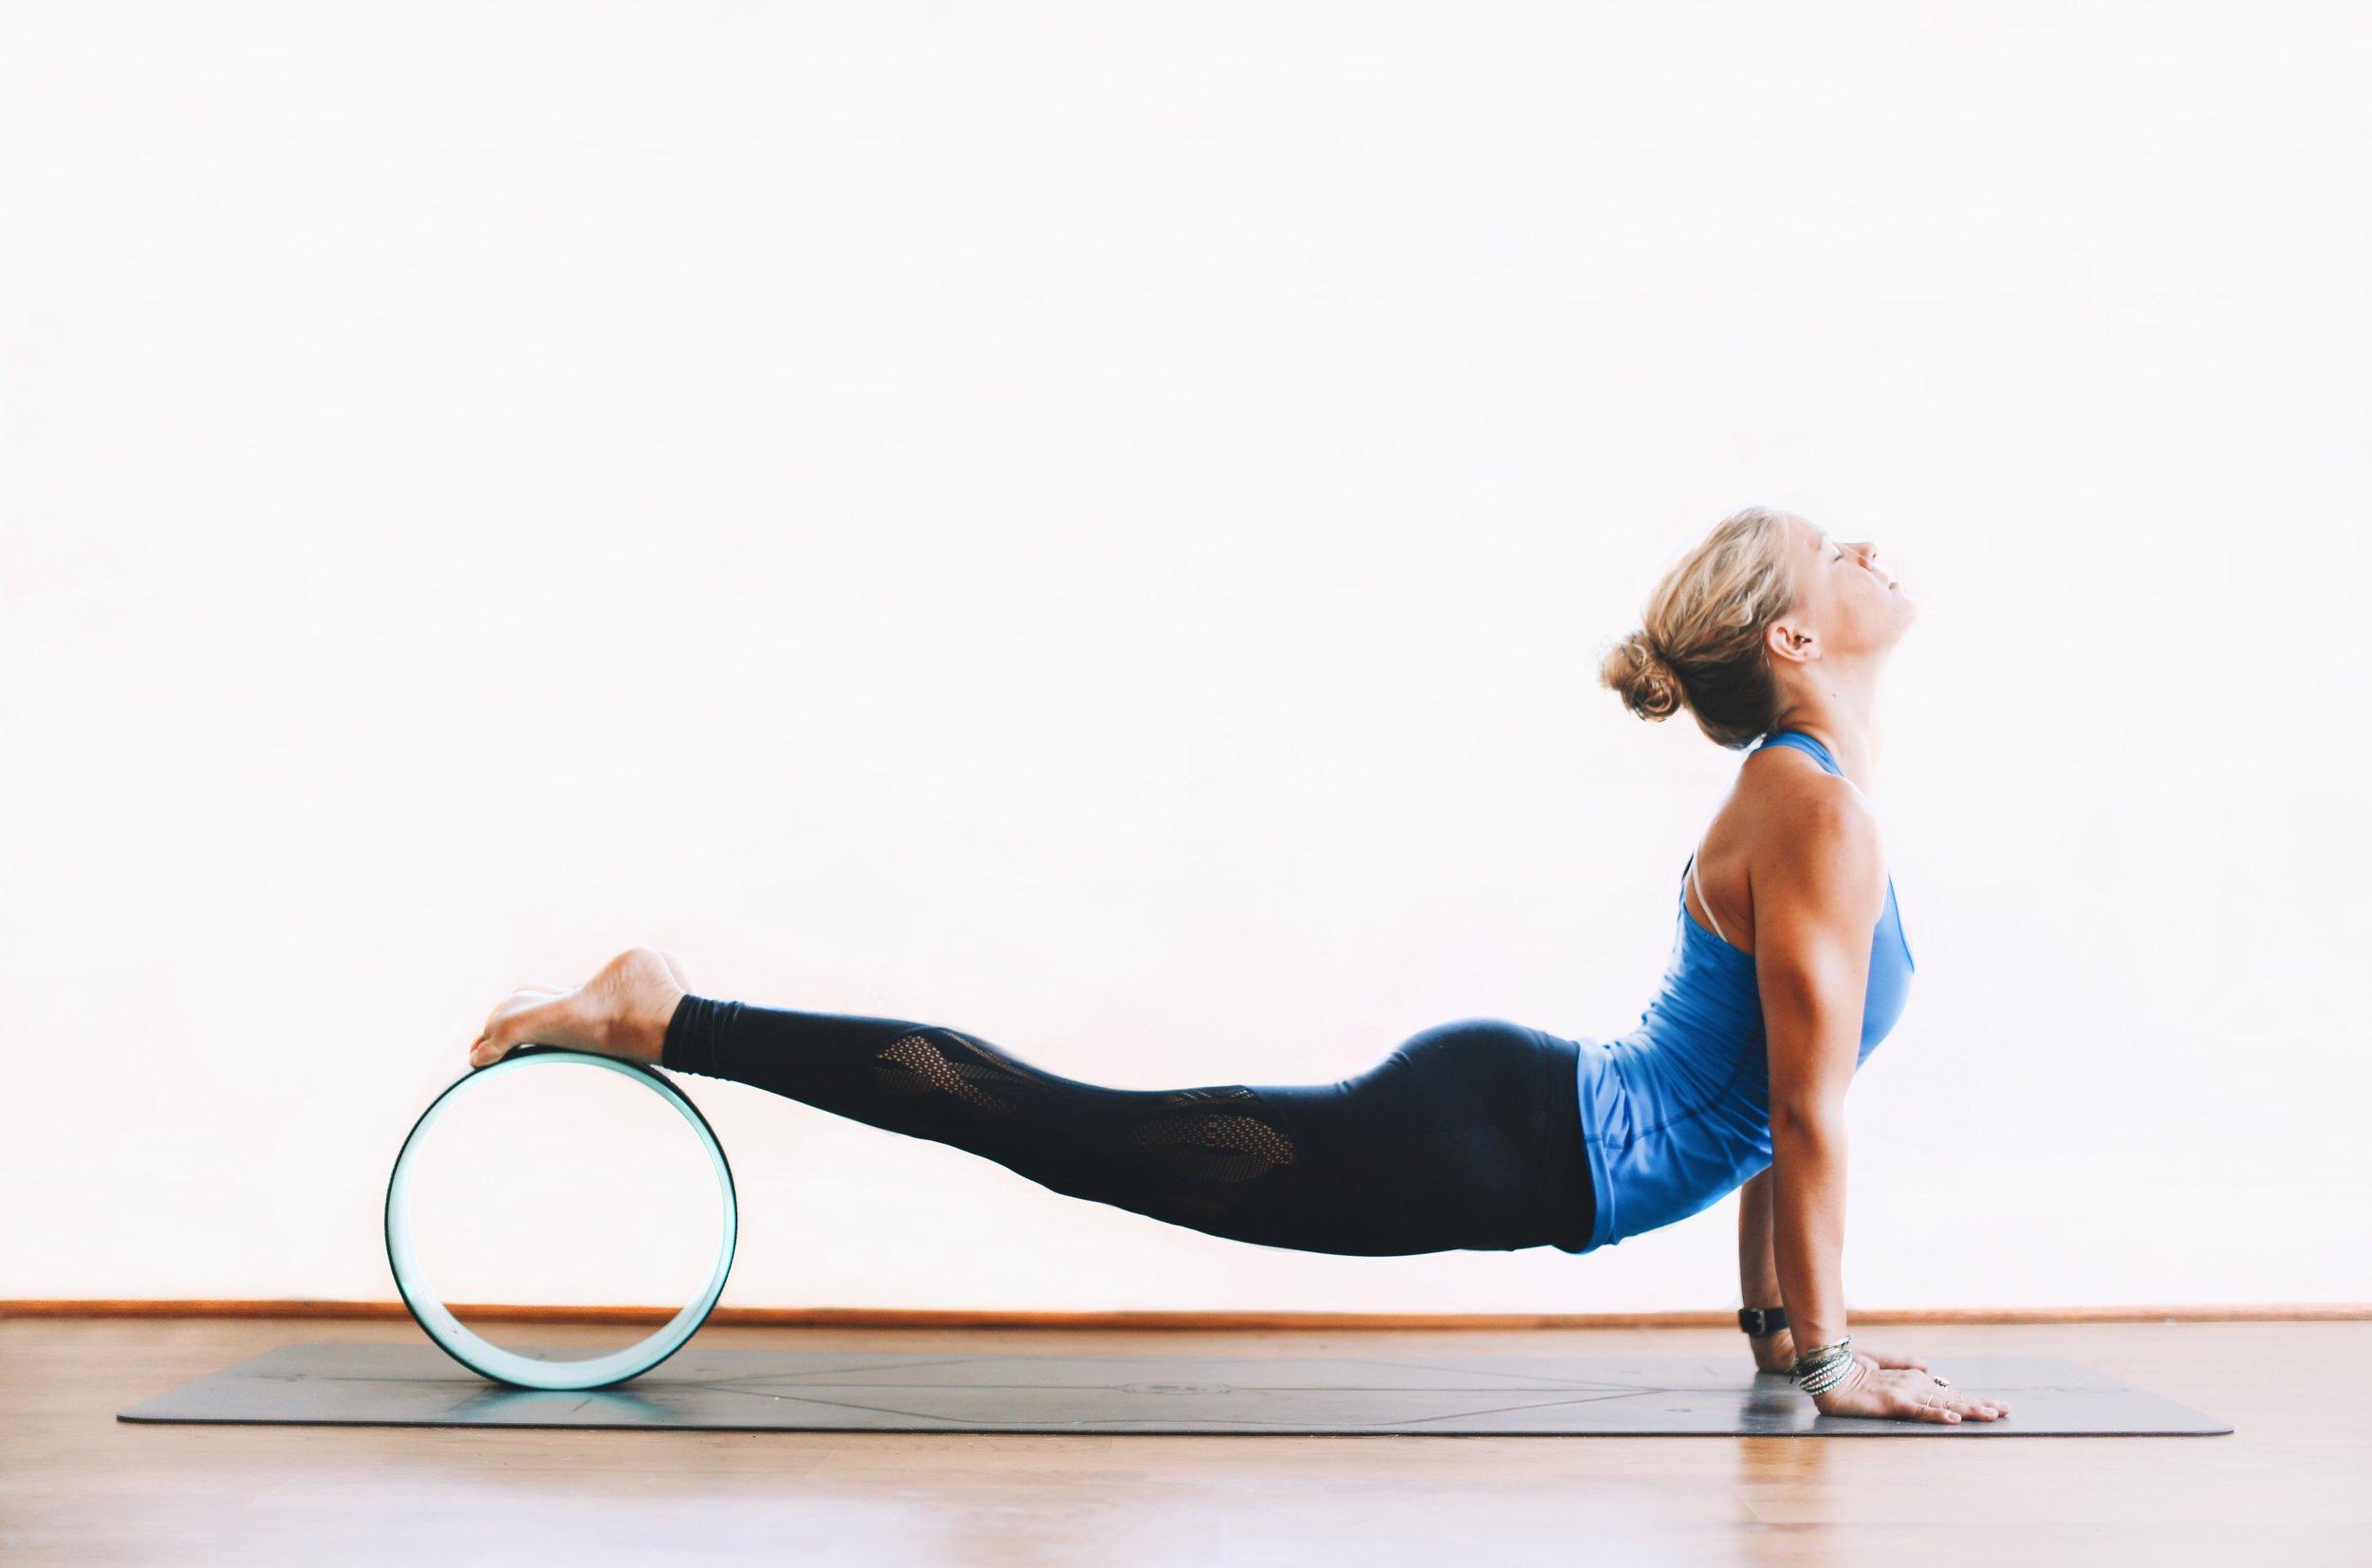 Lindley Battle doing yoga with yoga wheel: Photo by Lindley Battle